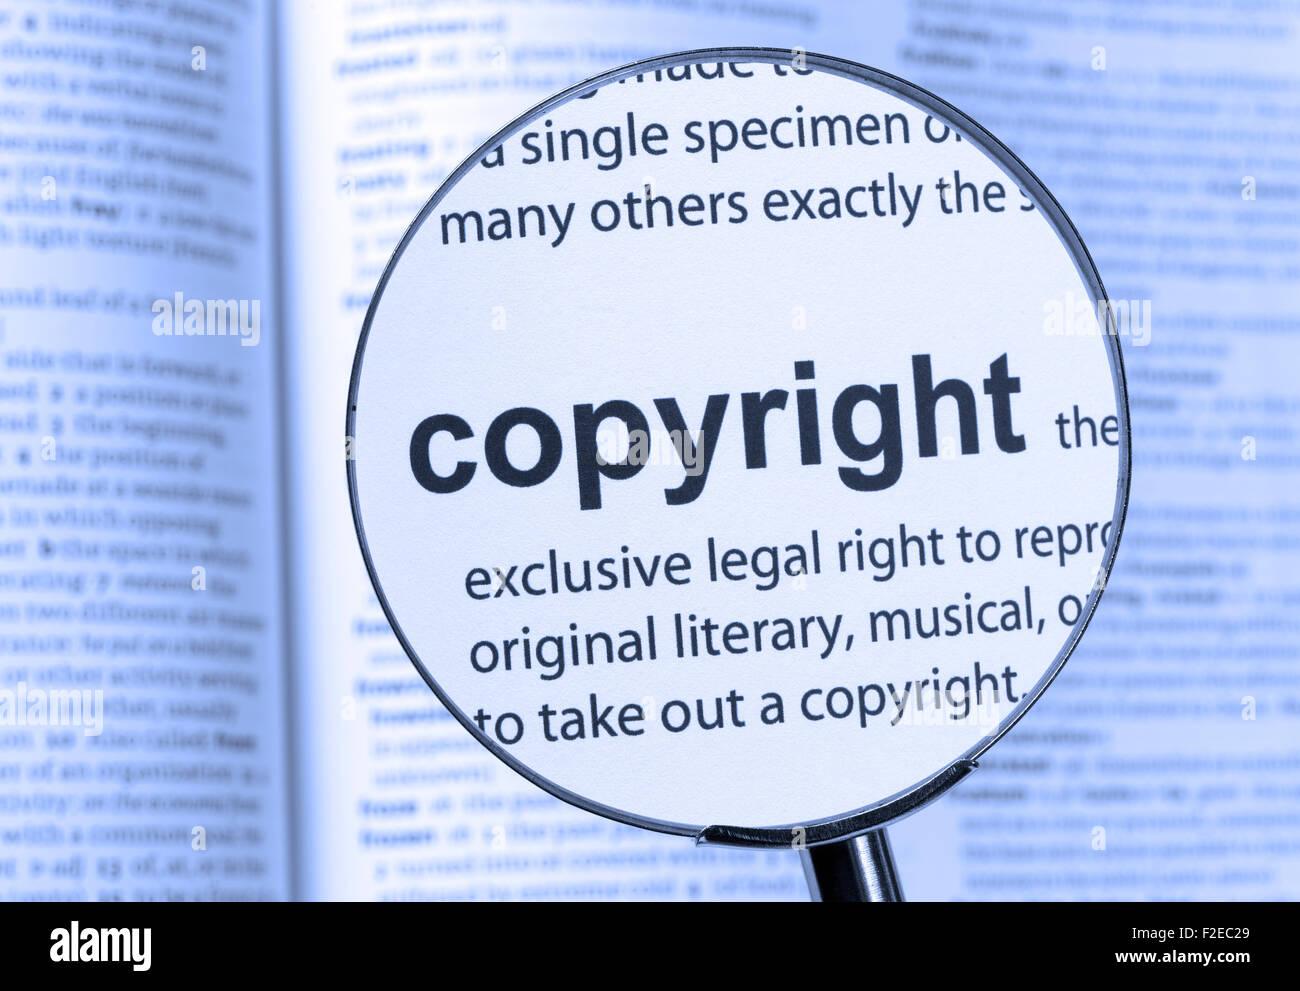 copyright dictionary definition single word stock photos & copyright